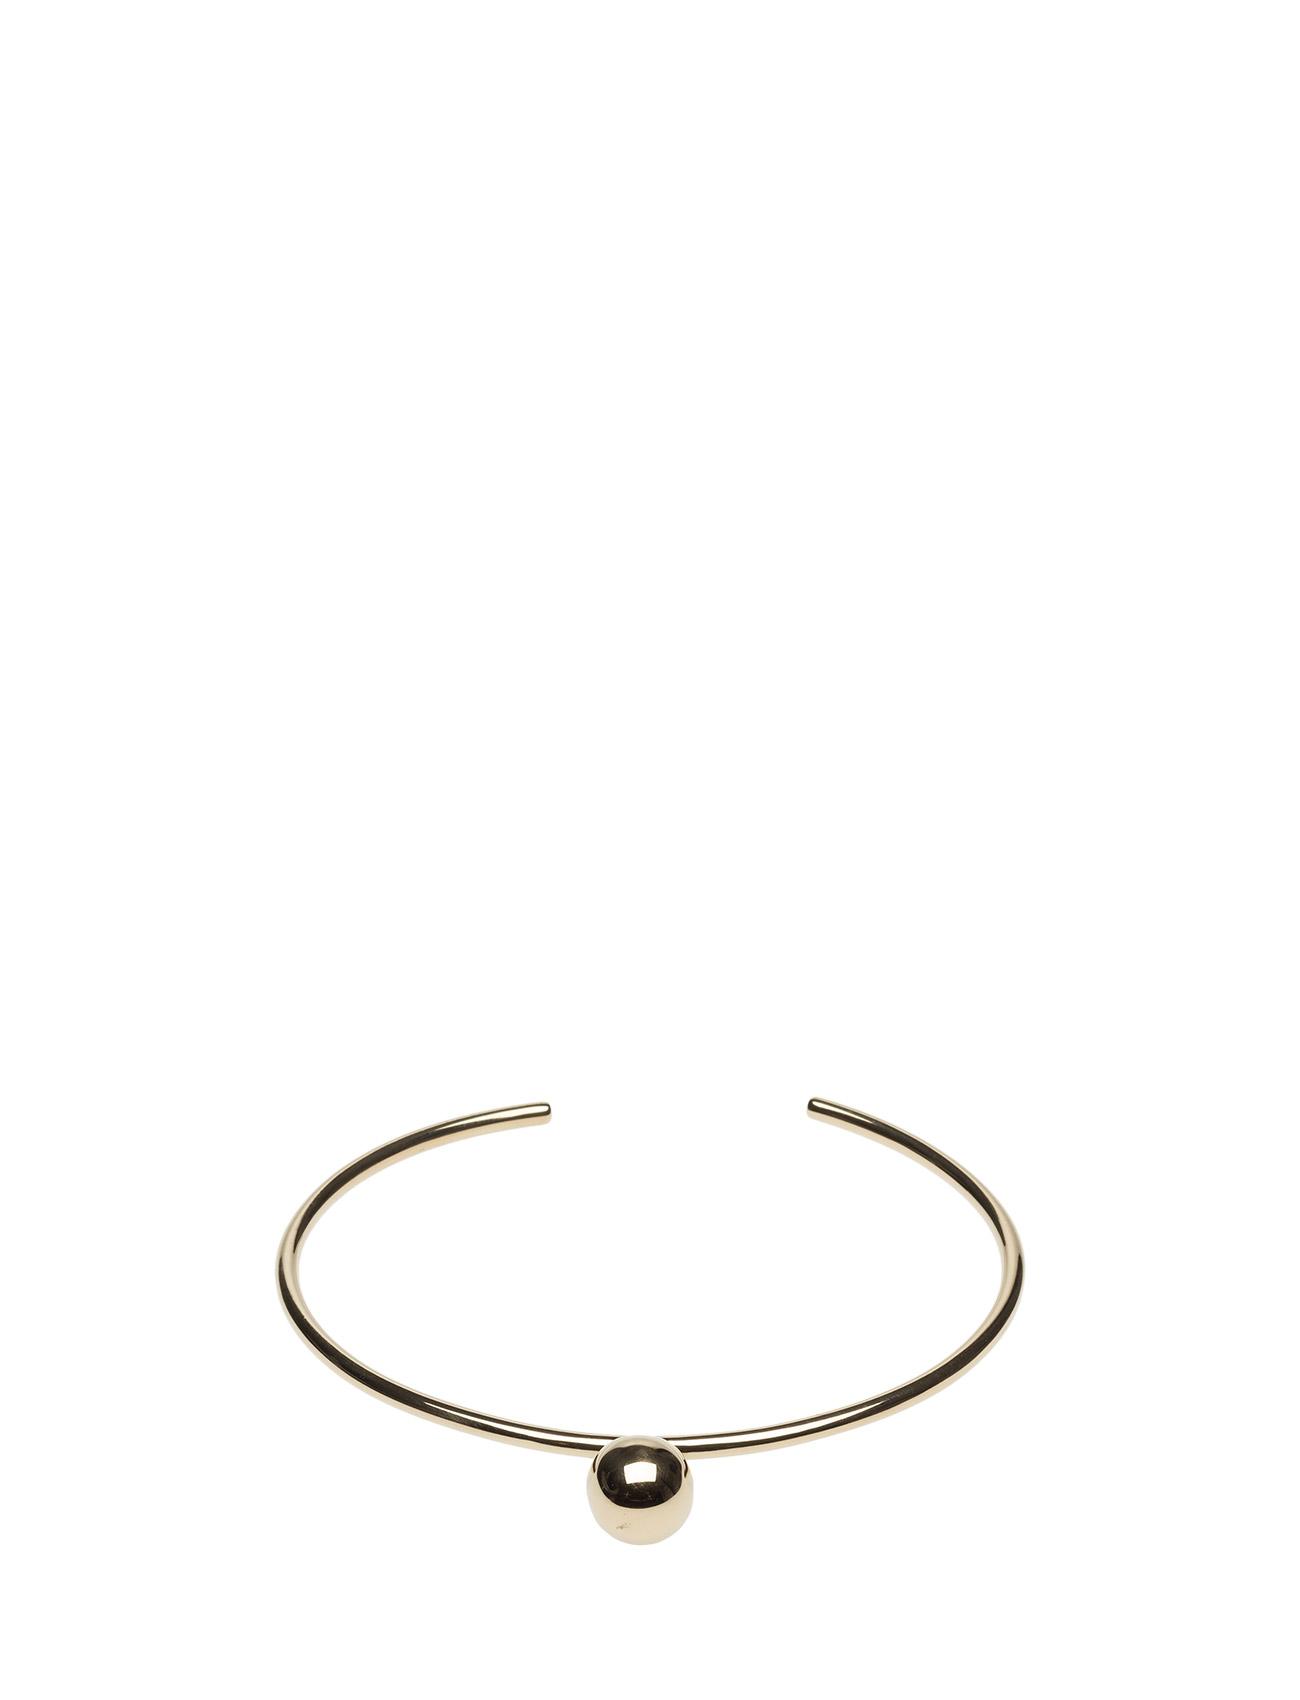 Single Ball Cuff Bracelet Lola's Love Smykker til Kvinder i Guld